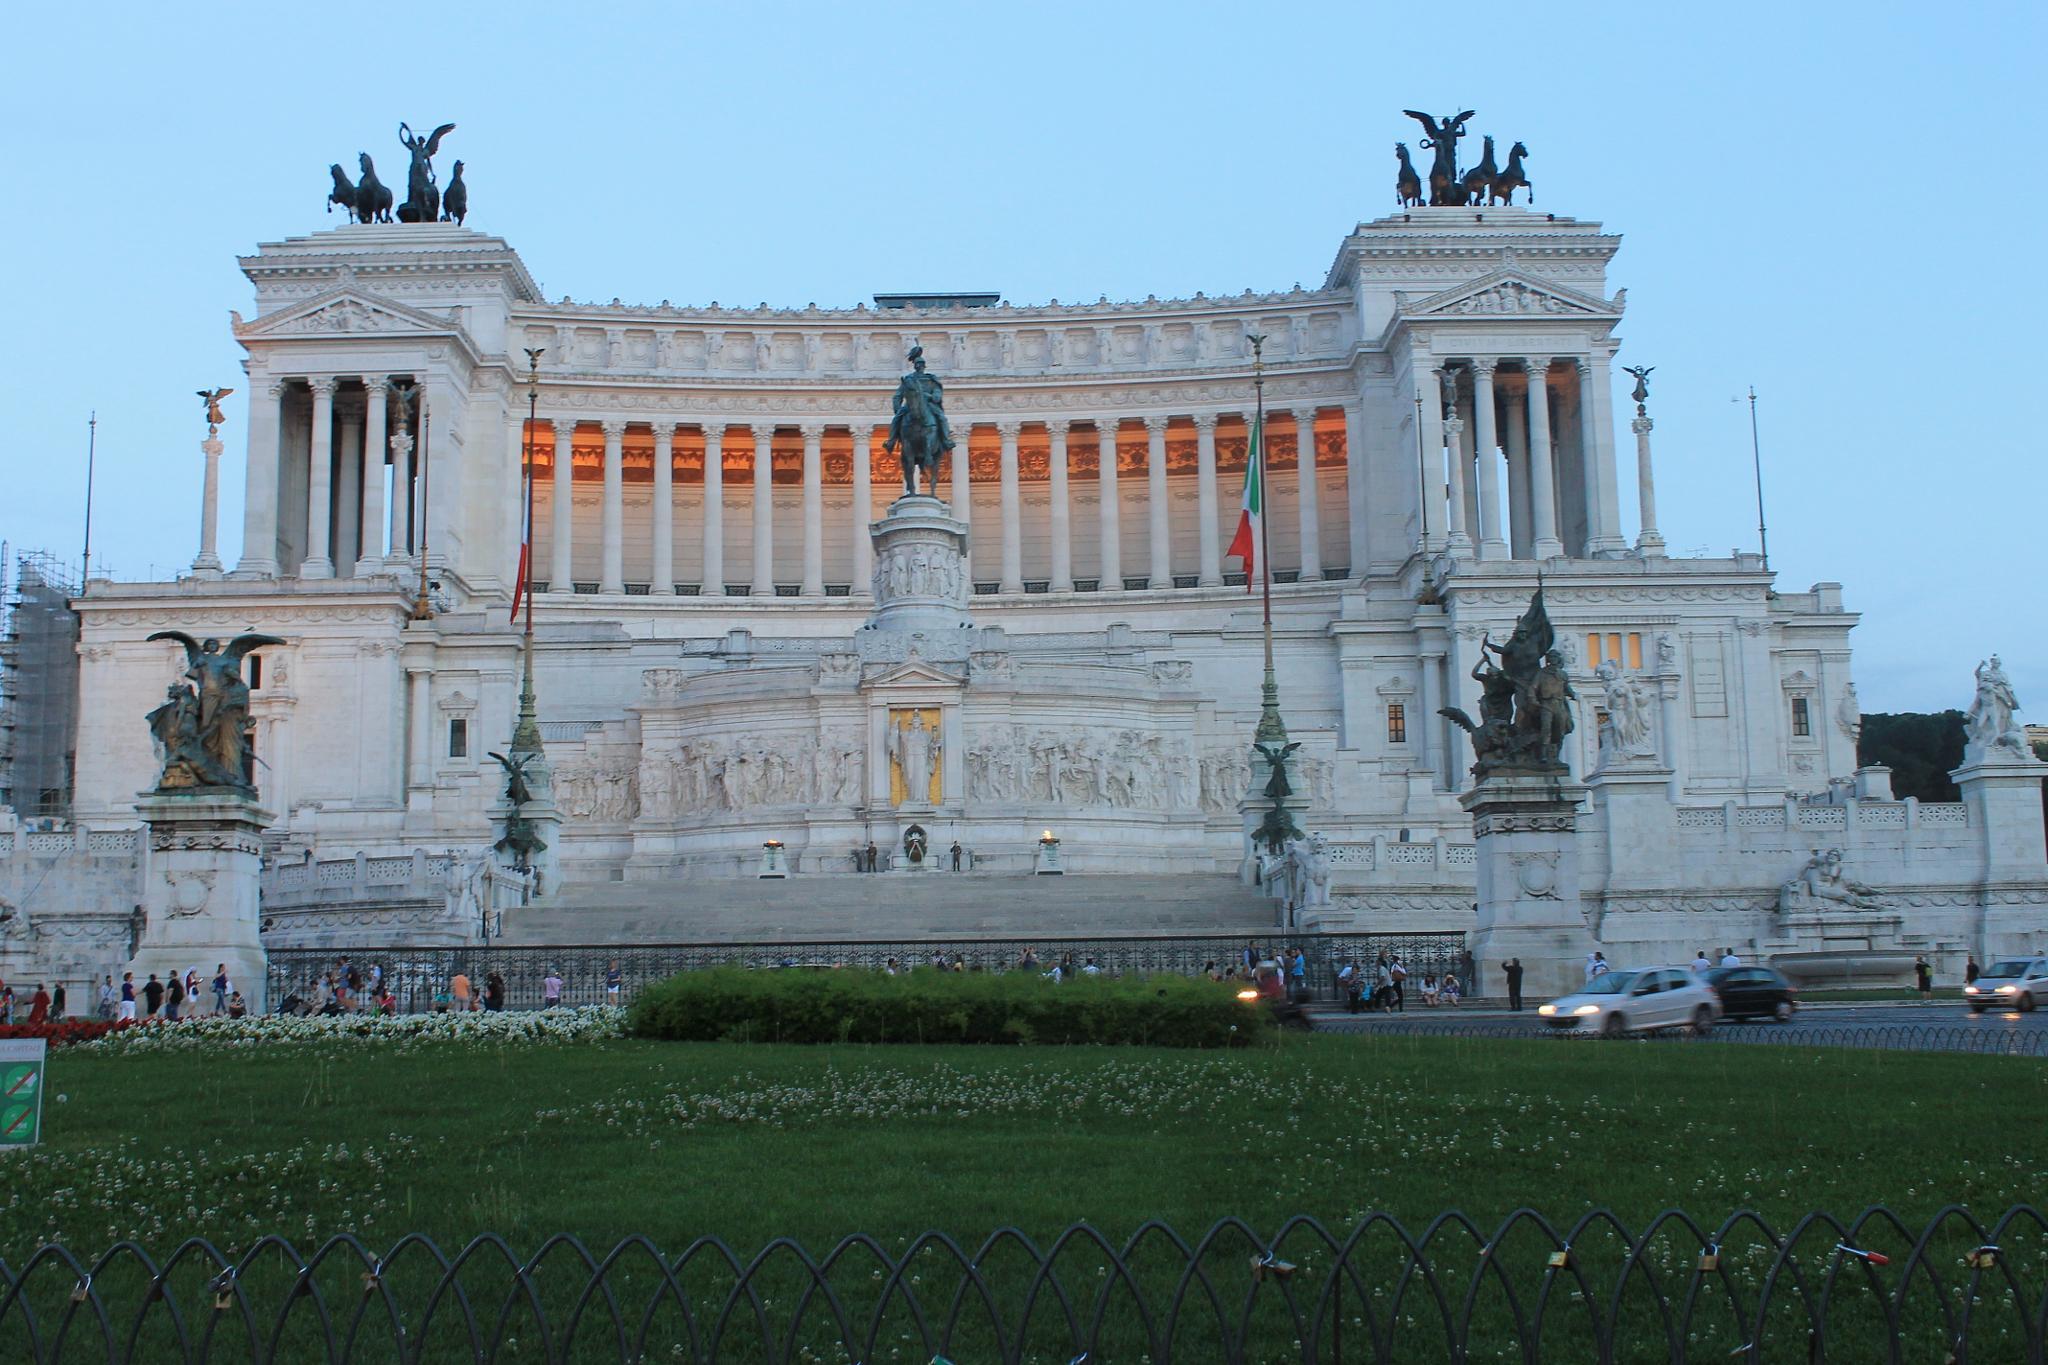 Roma by Janez Štros